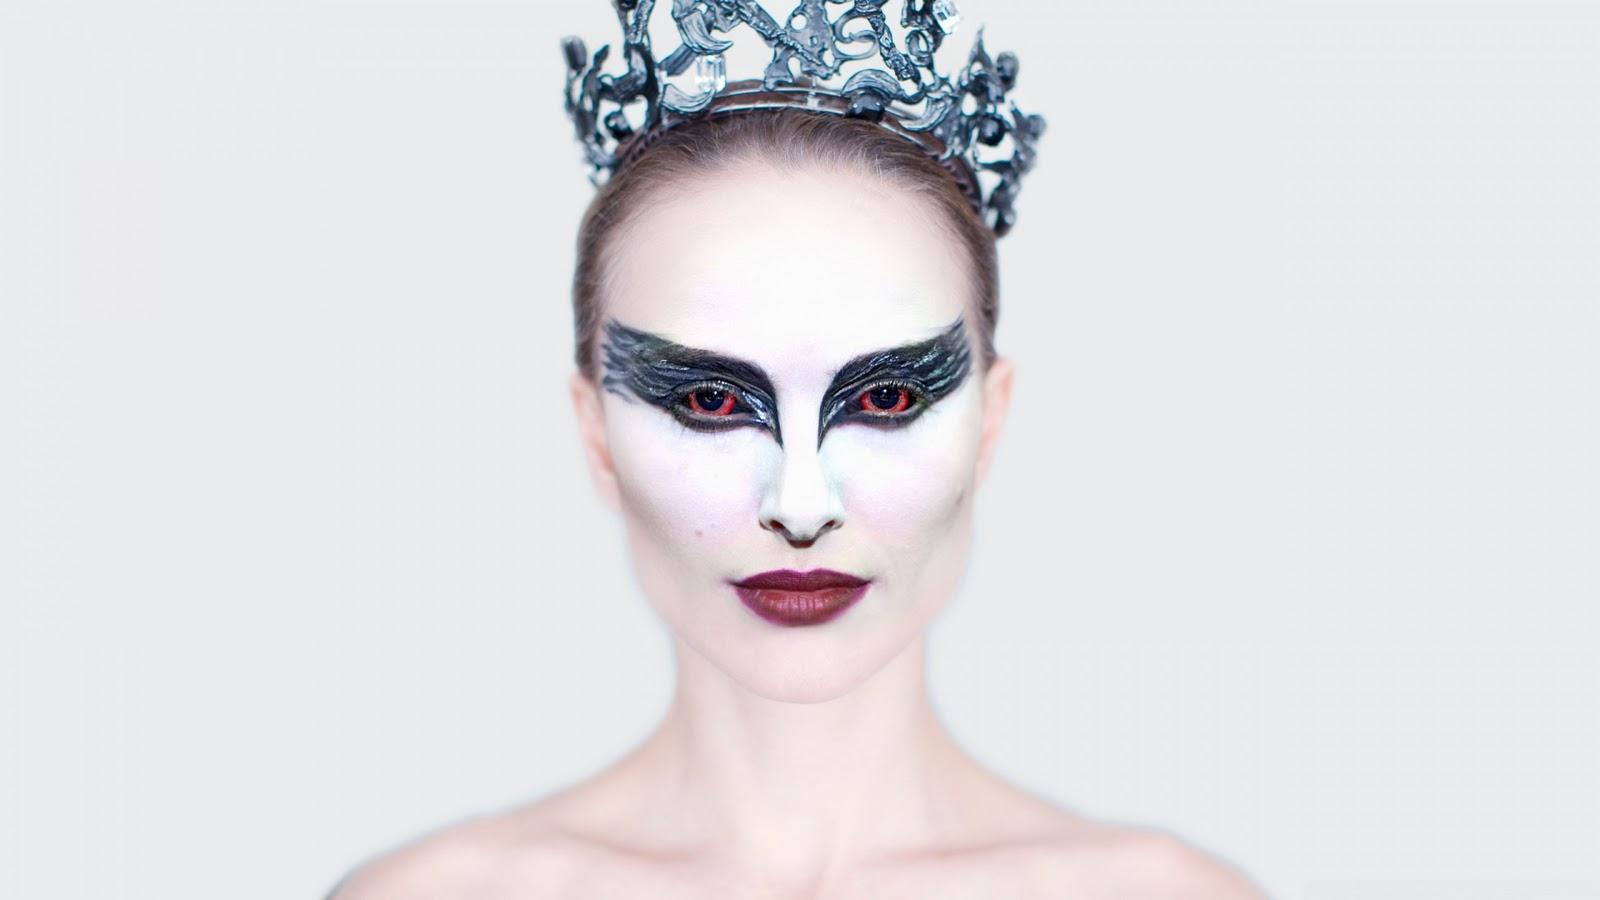 http://3.bp.blogspot.com/-YfB_gDravU8/TWRJgOQvuvI/AAAAAAAAAd4/KDAI7ml8z5M/s1600/Black-Swan-Wallpaper-Photo-Natalie-Portman-as-Nina-Sayers-1.jpg